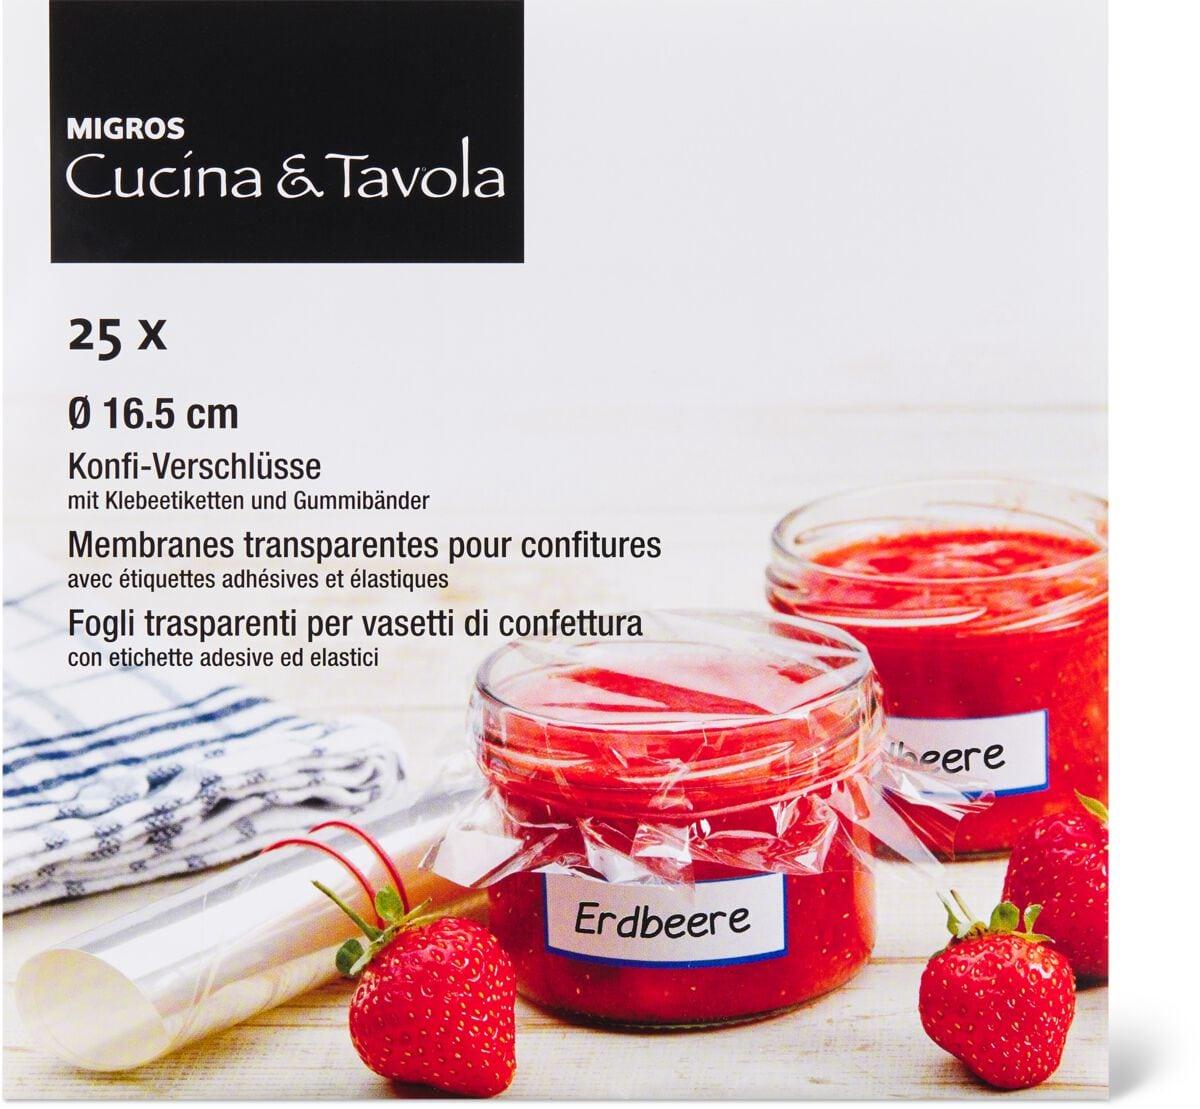 Cucina & Tavola Membranses transparentes pour confitures